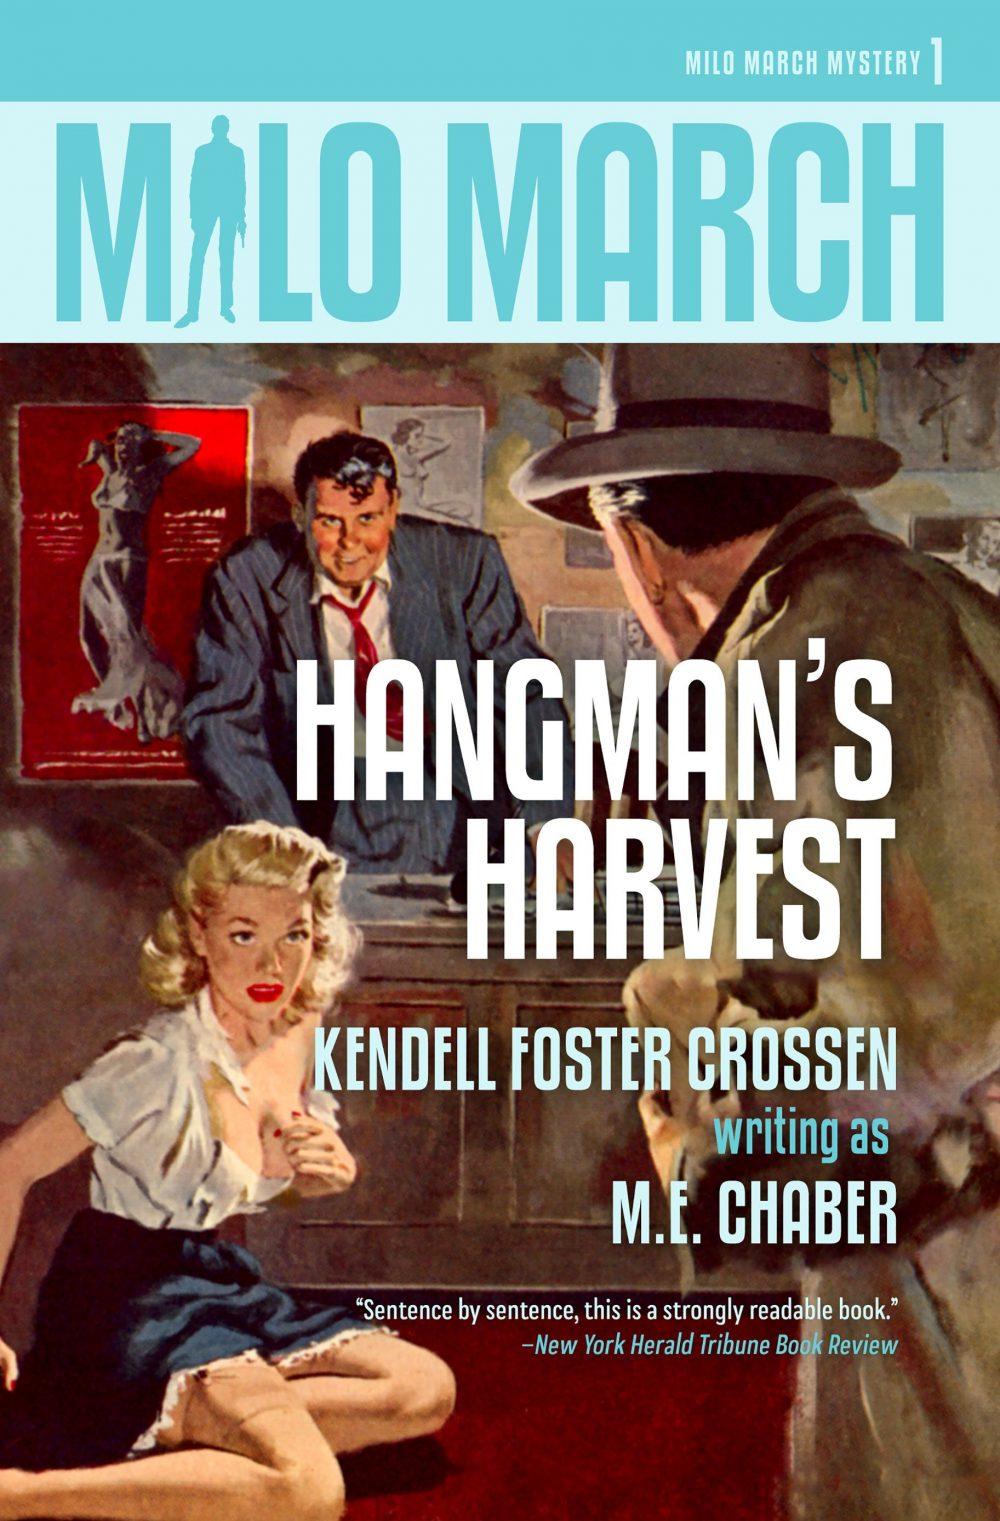 Milo March #1: Hangman's Harvest